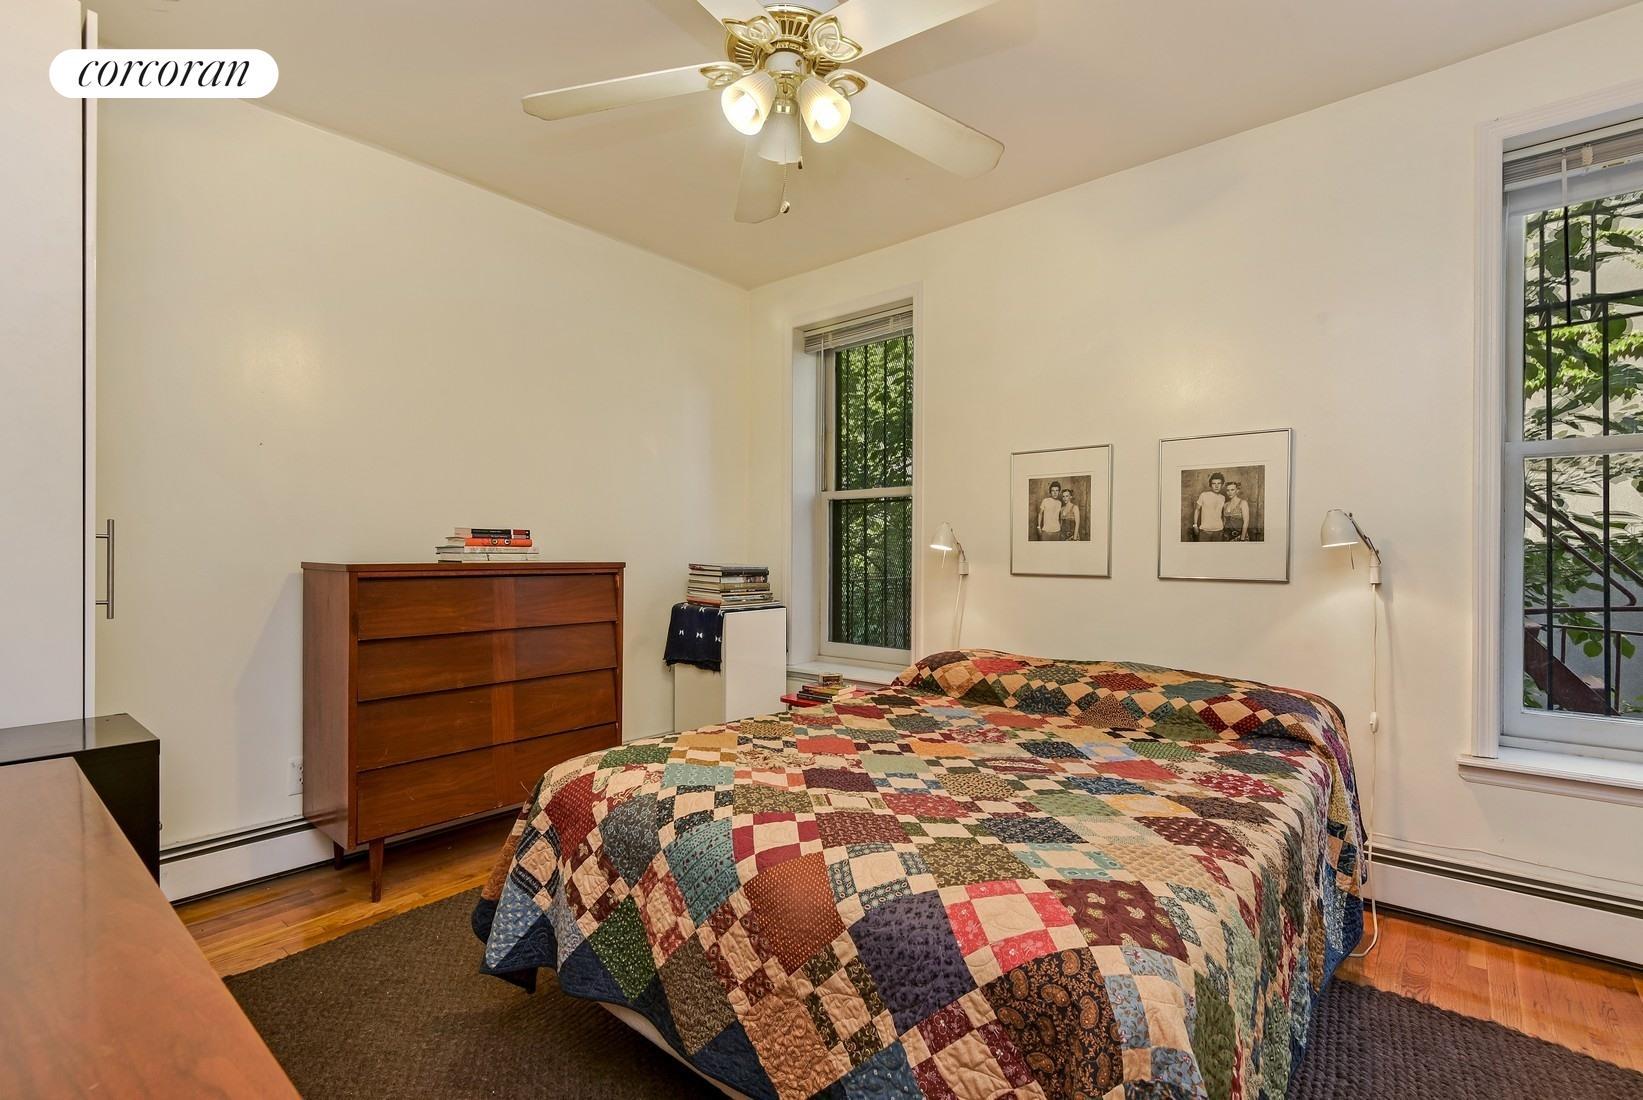 Corcoran 393 Hicks Street Cobble Hill Real Estate